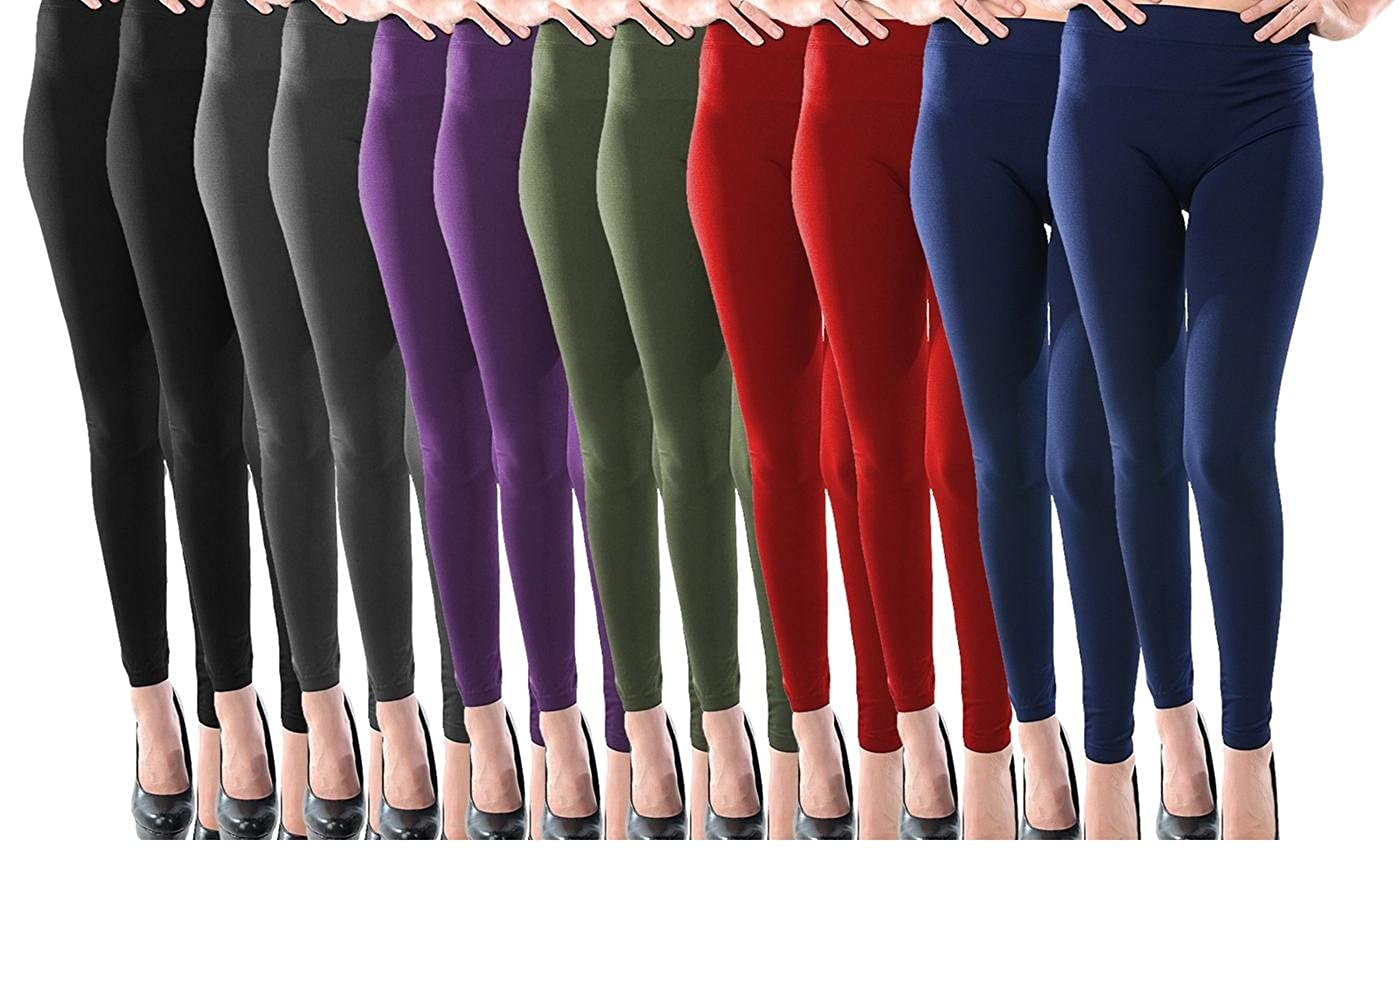 d0e87bf4fc8 EAG 12-Pack High-Waist Ladies Yoga Pants